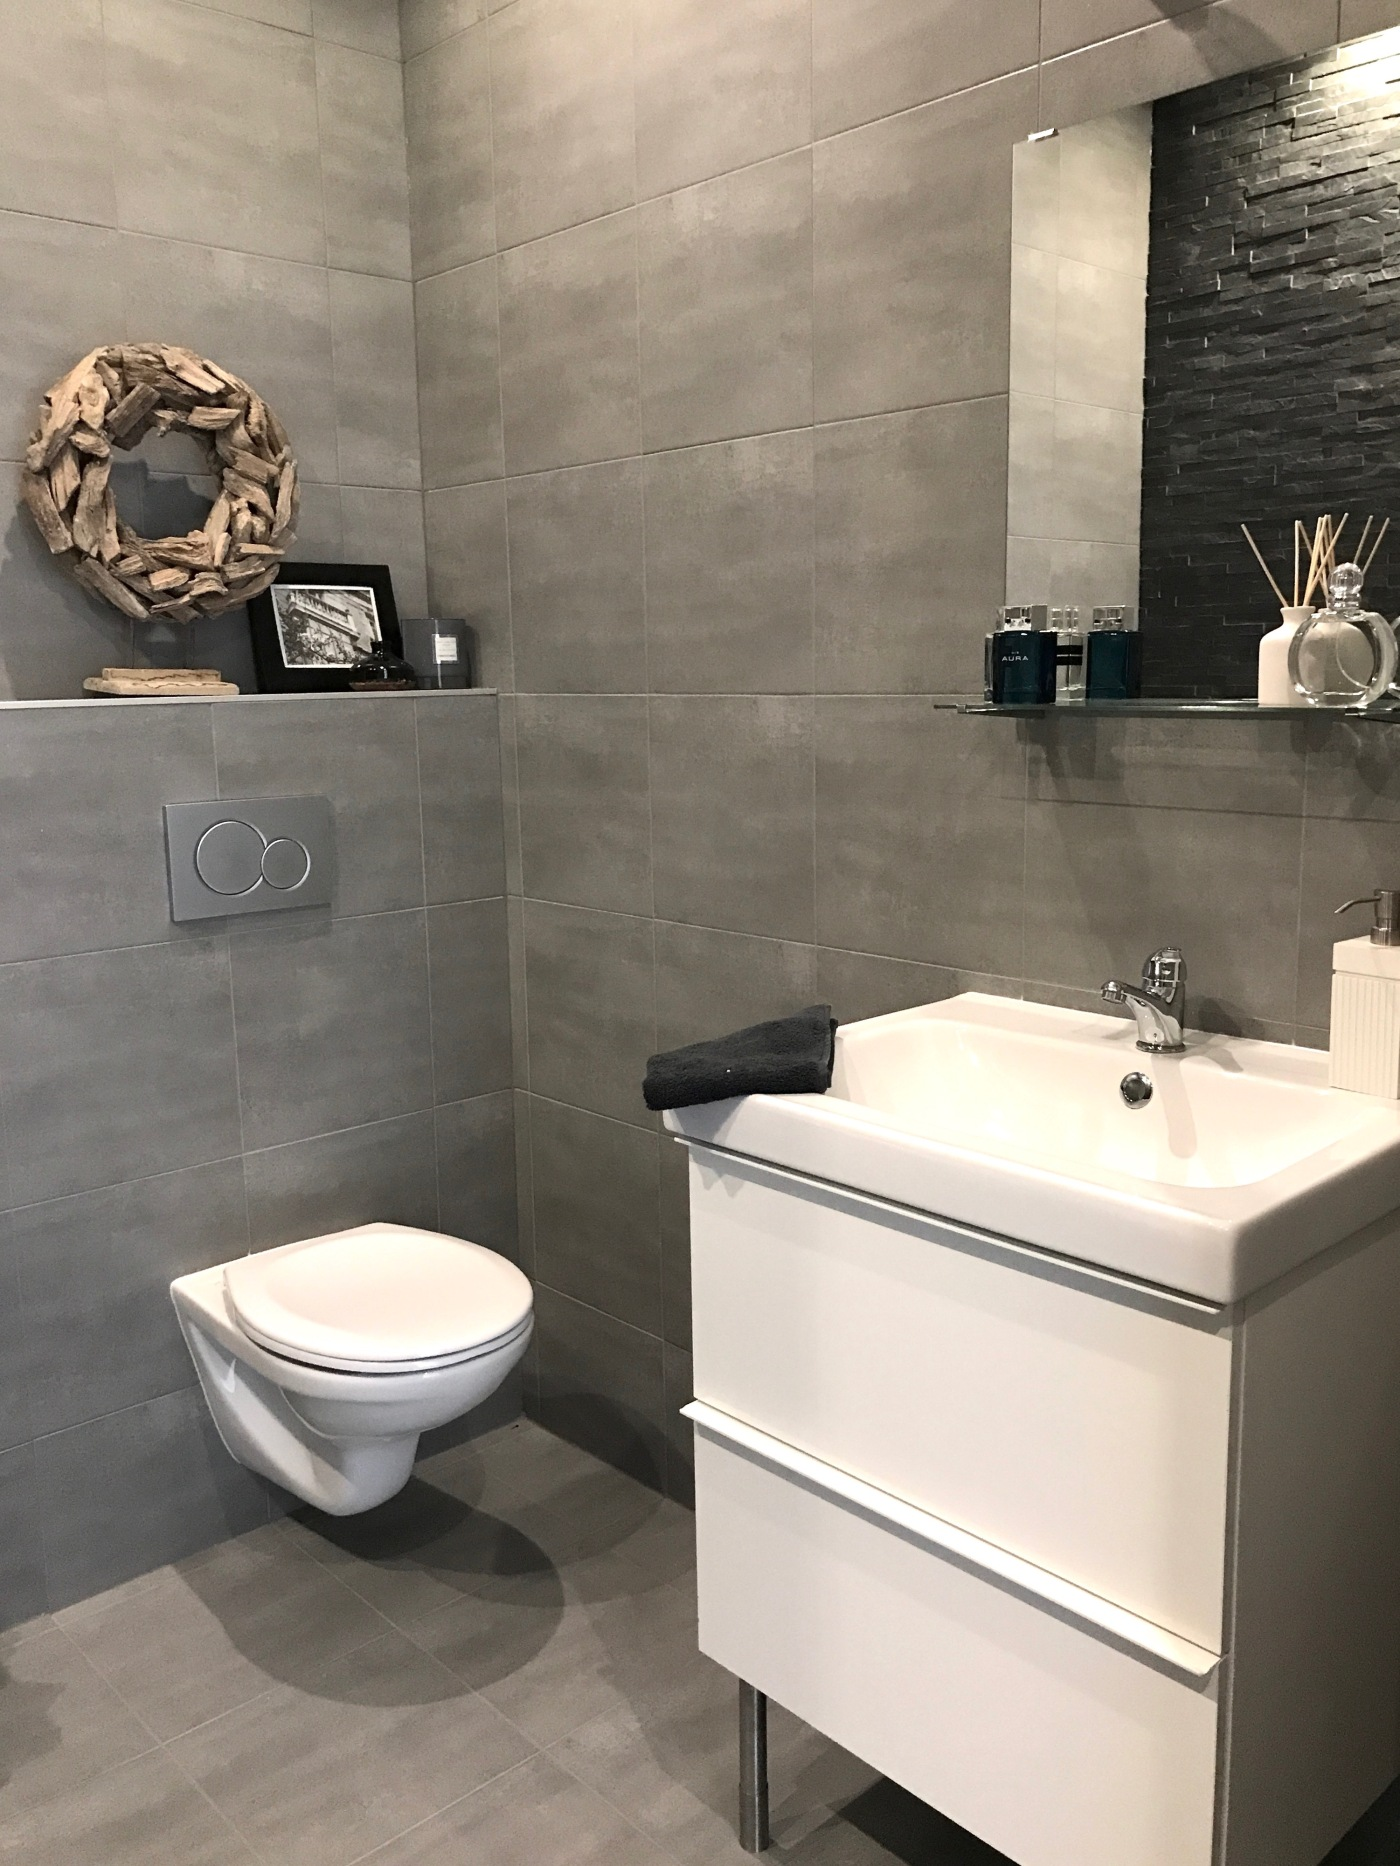 JaimyInterieur_Piron badkamer wastafel 1